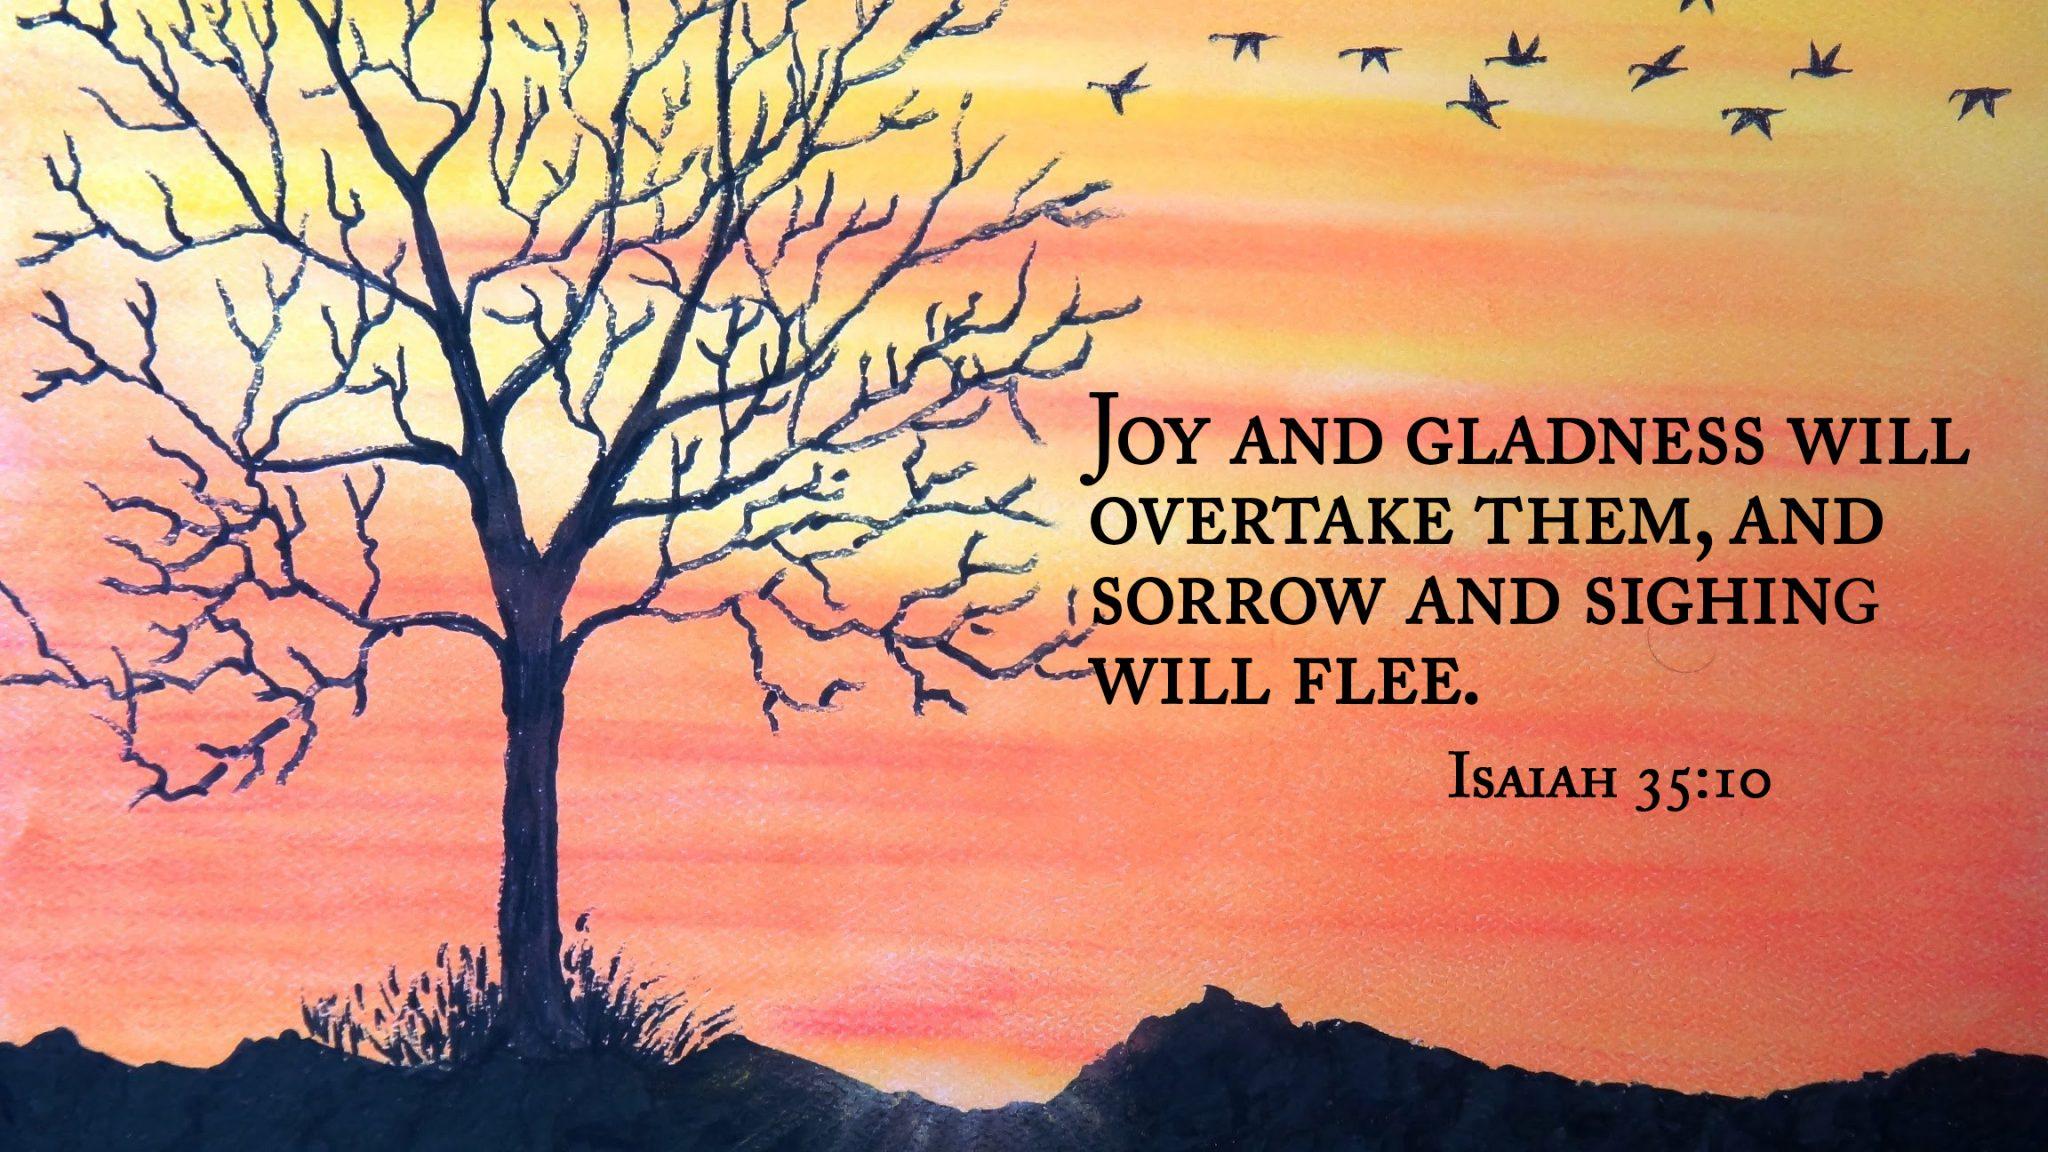 Isaiah 35